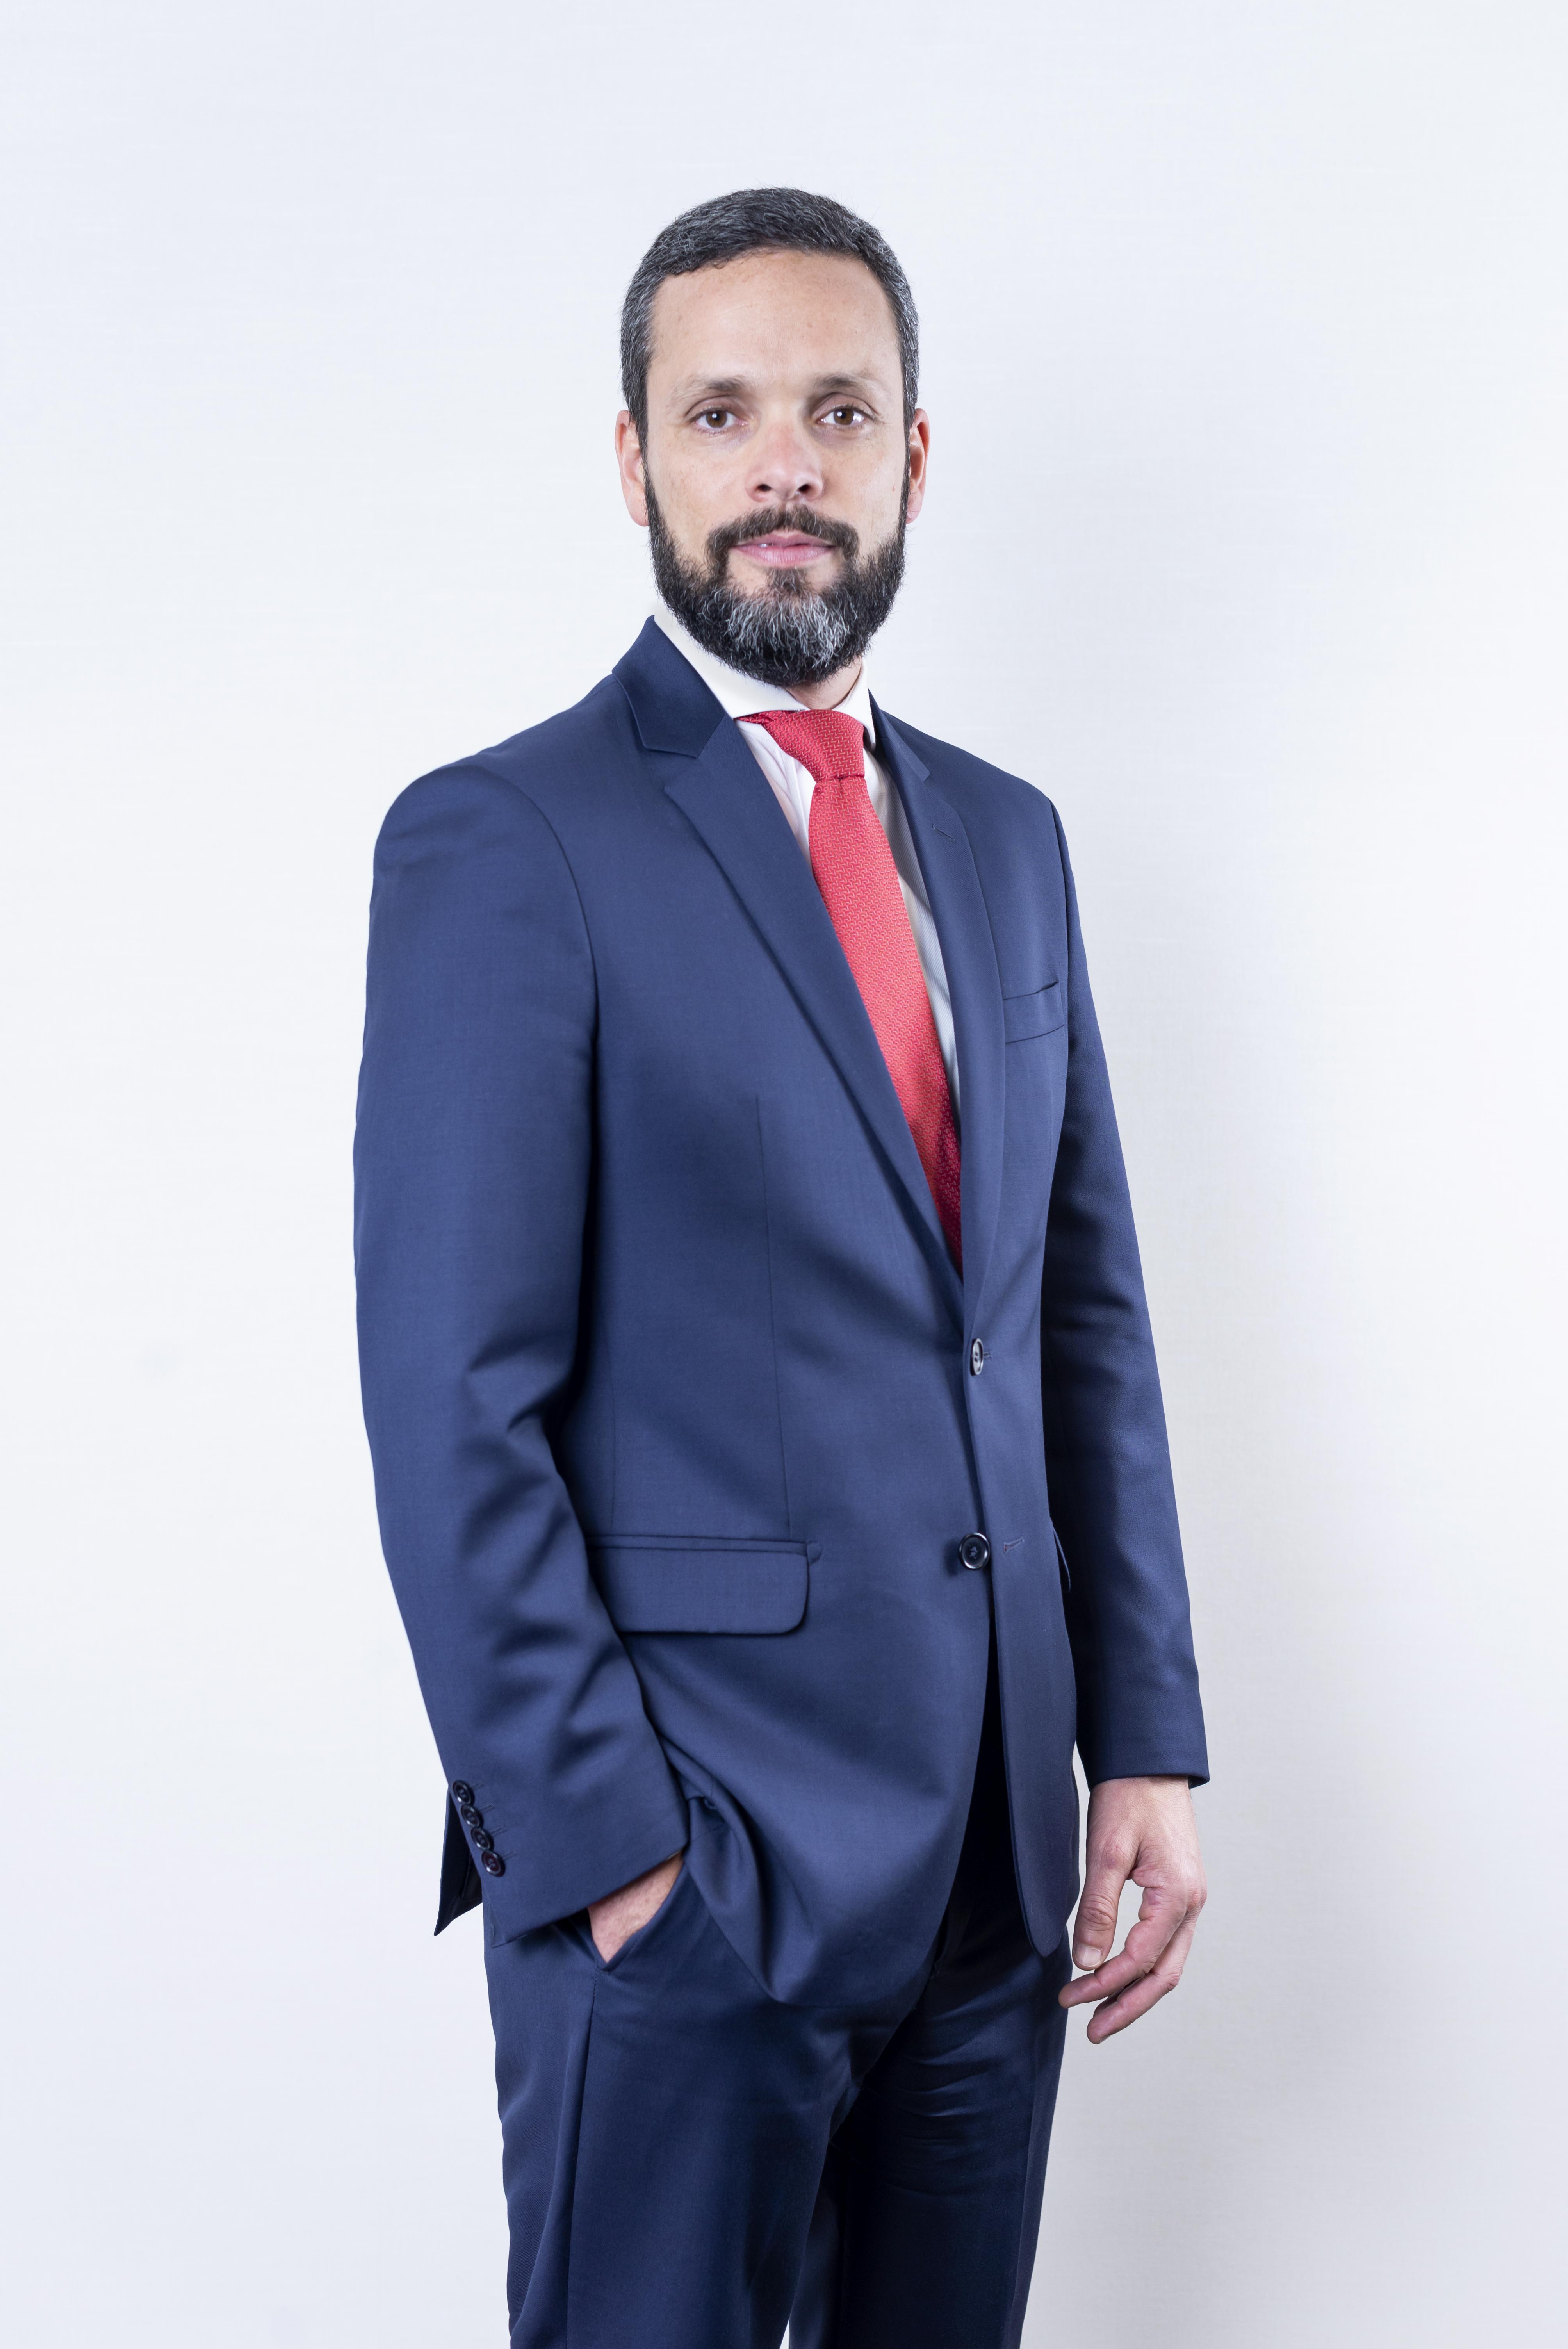 Gustavo Passos - Pwc